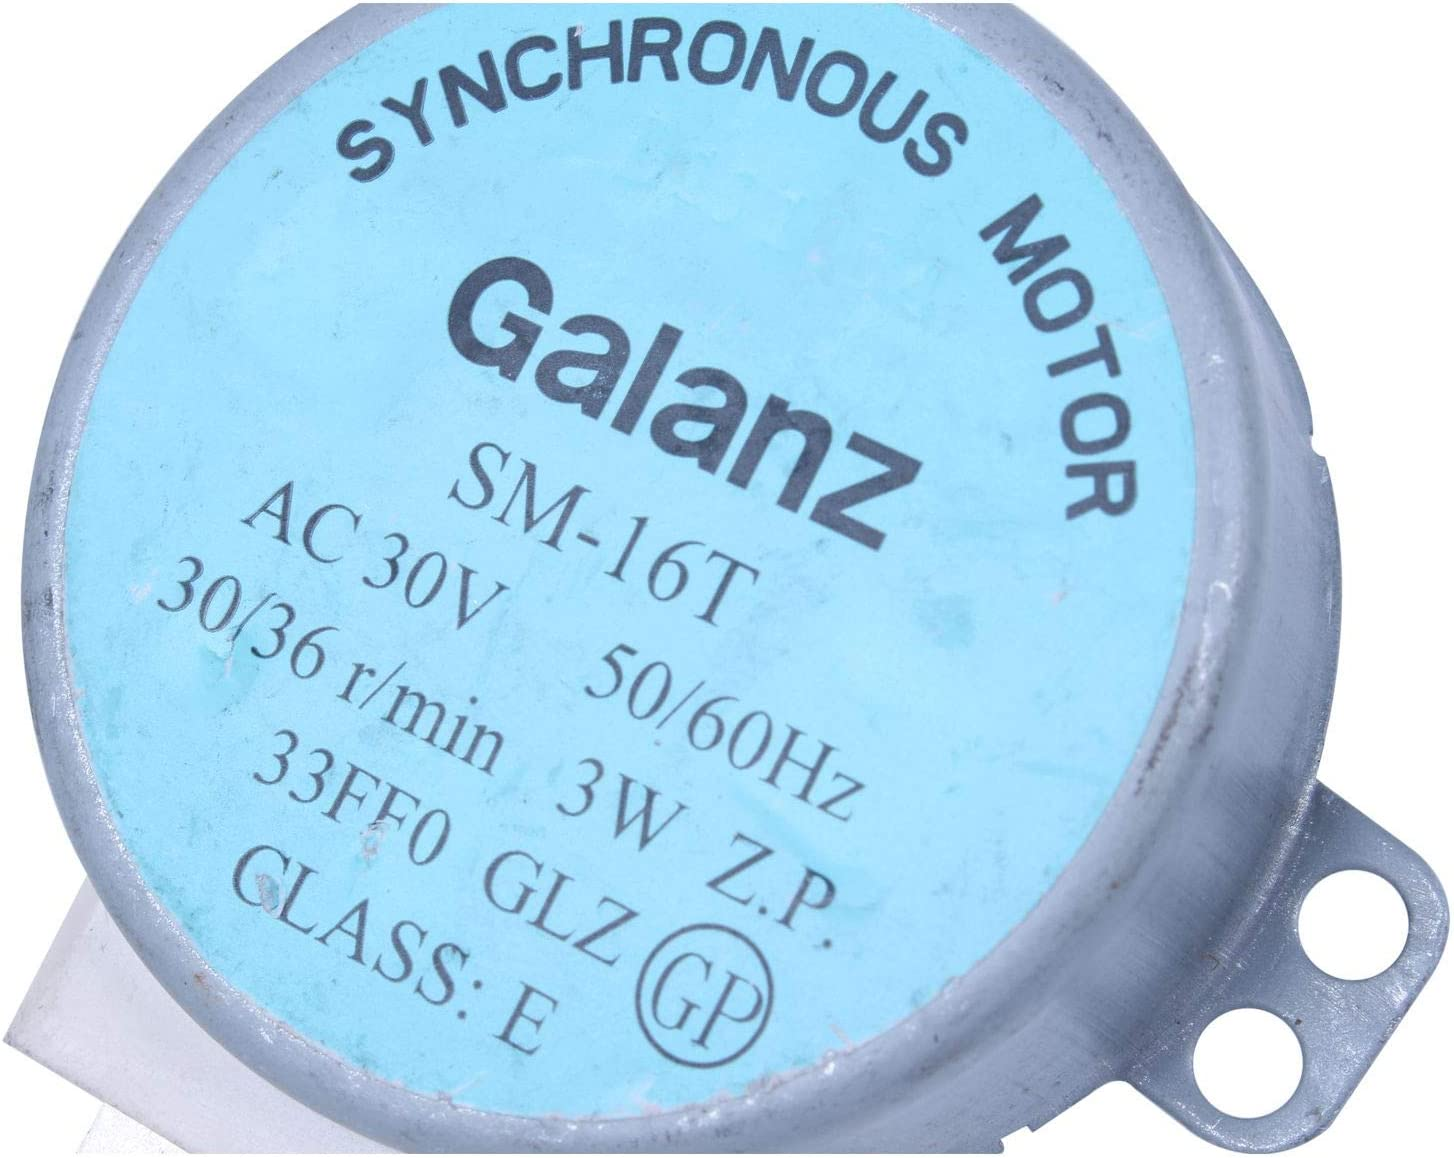 Cikuso Sm-16t AC 30v 3.5 / 4w 30/36 r/min Motor sincrono para ...